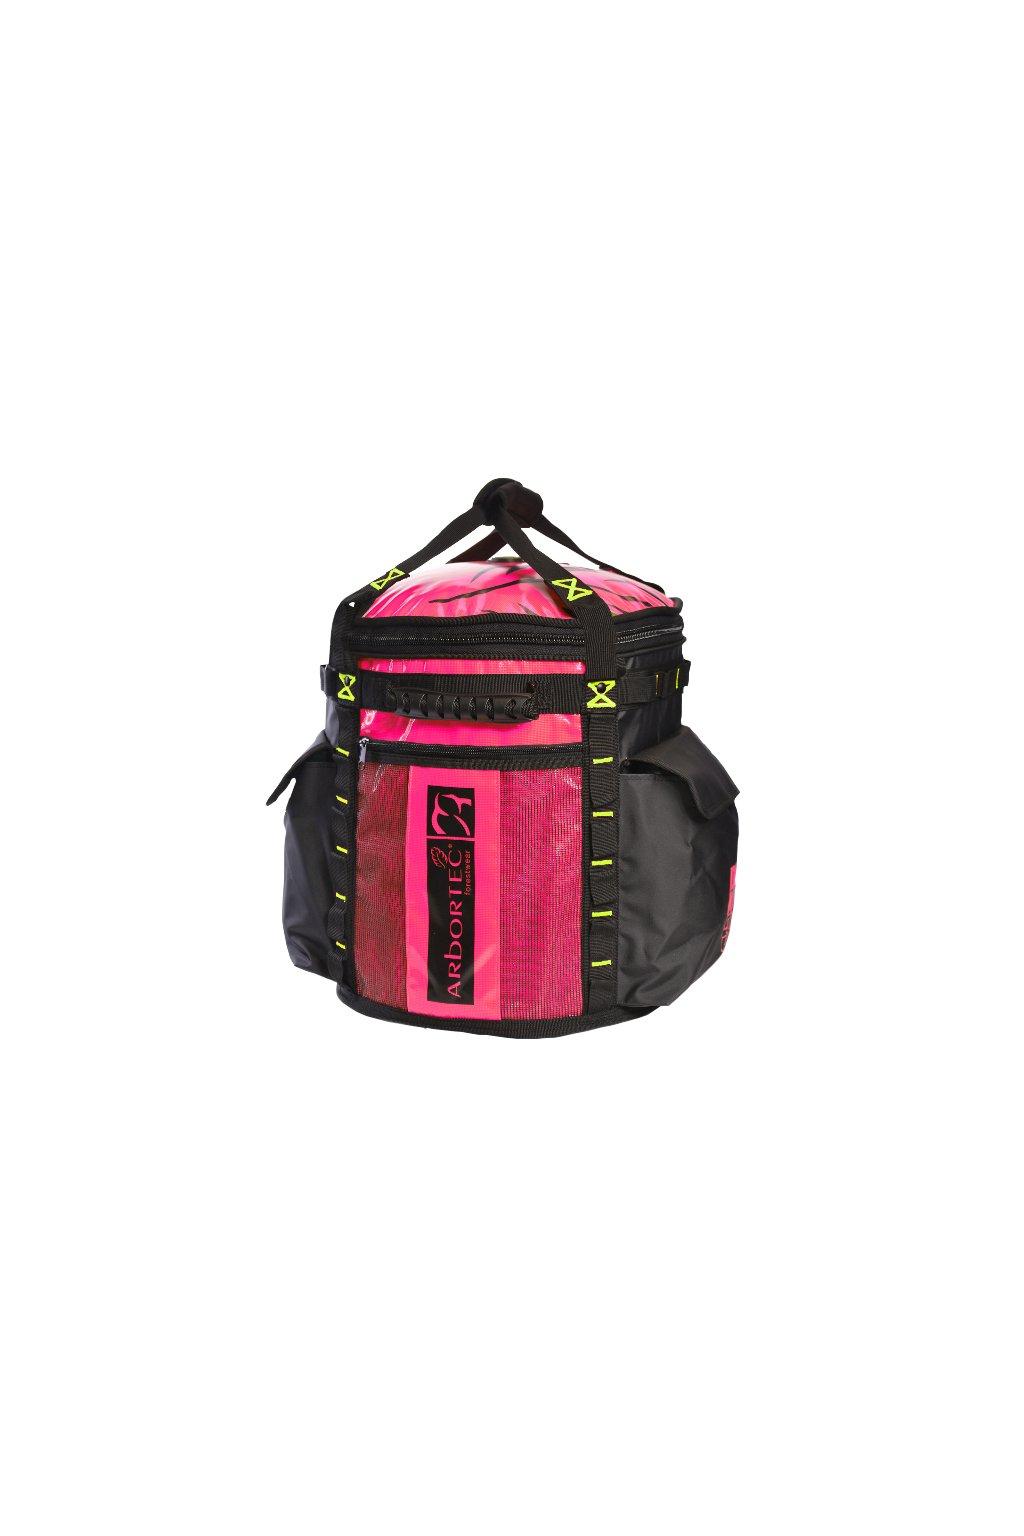 105 pink 567x